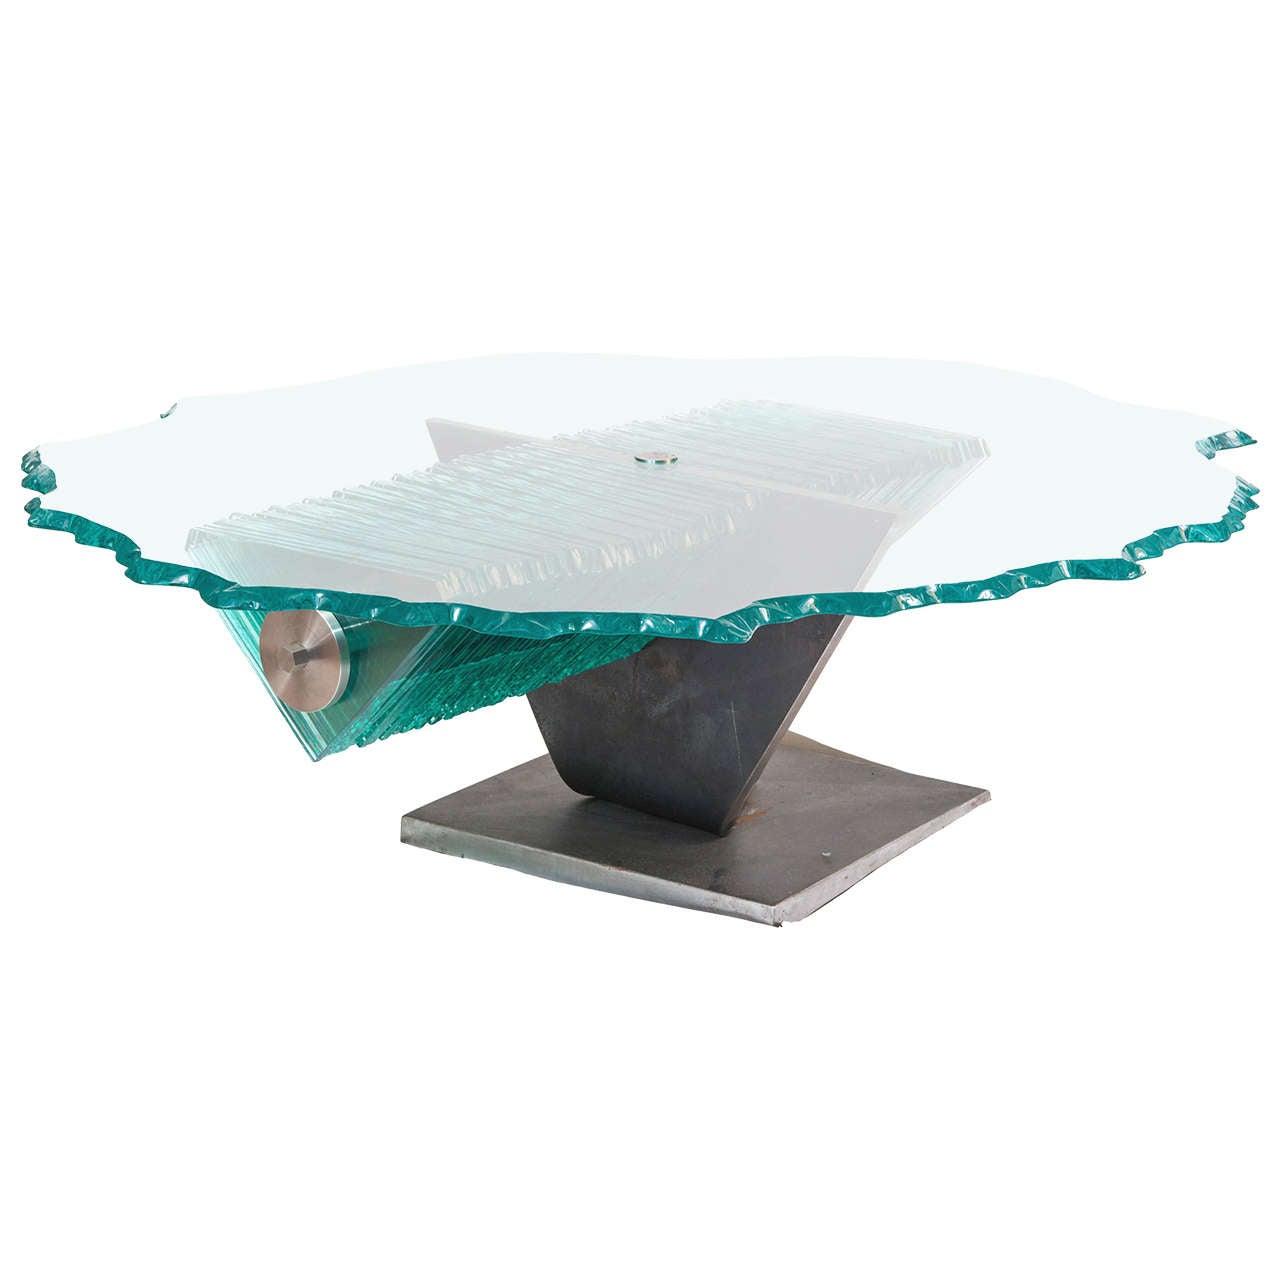 Danny Lane coffee table, steel and glass, England circa 1980